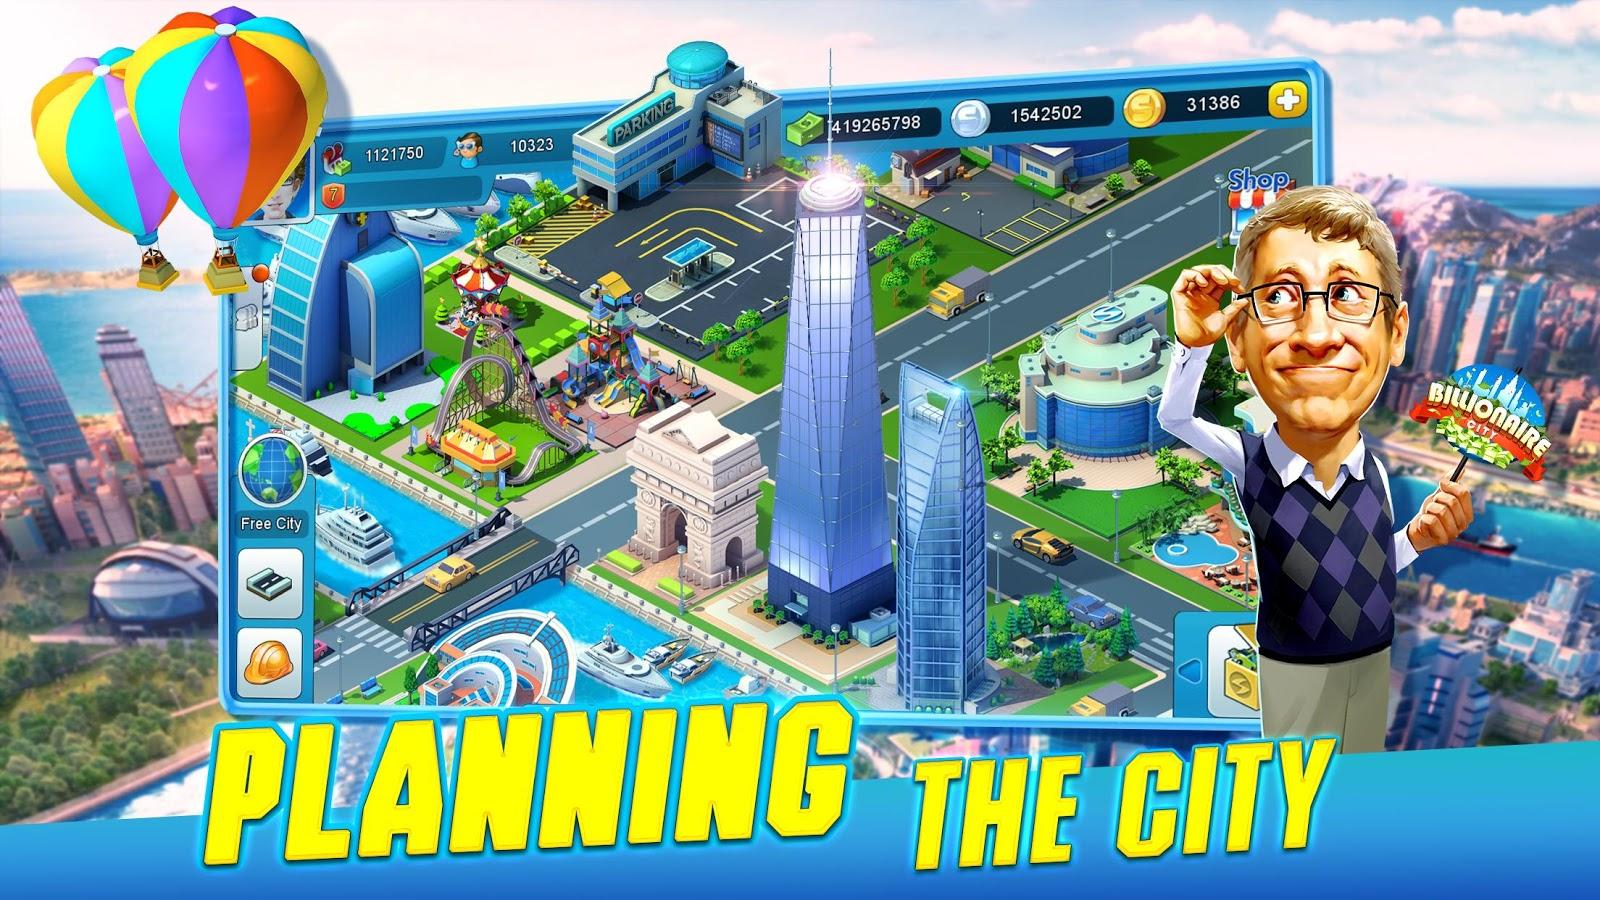 Billionaire Stadt android spiele download